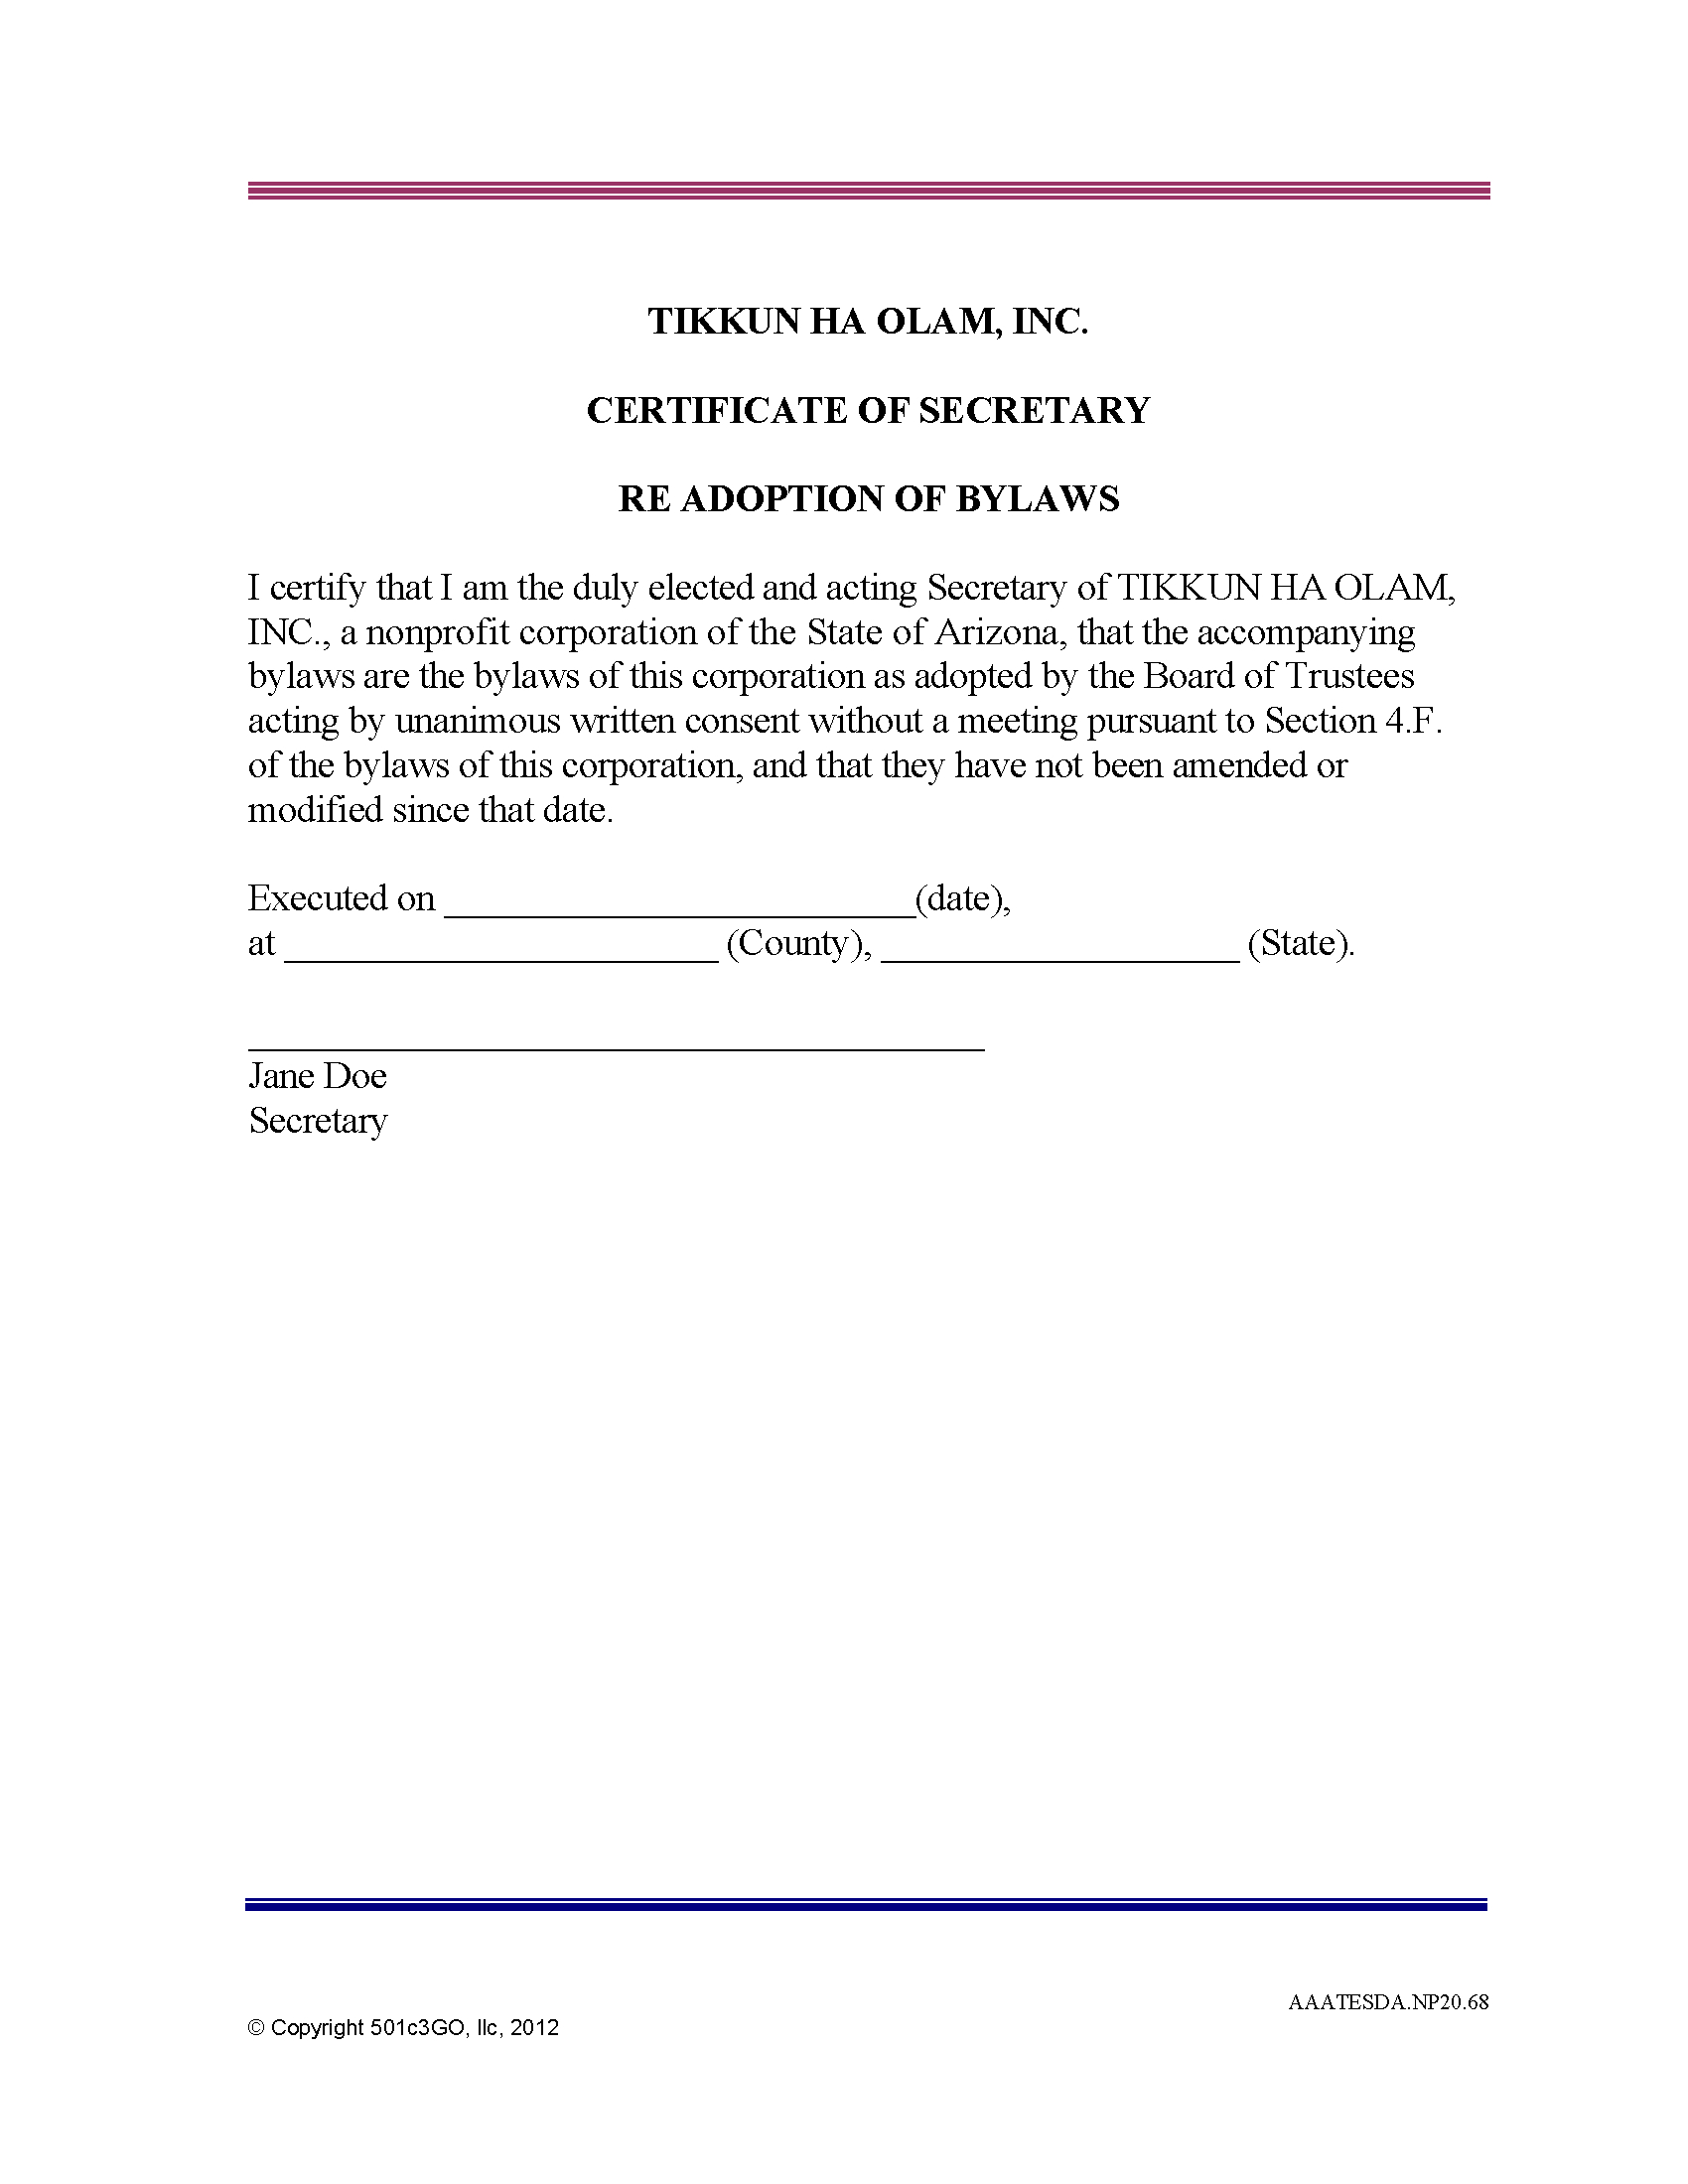 Certificate Of Secretary Re Adoption Of Bylaws | 501C3Go Regarding Corporate Secretary Certificate Template